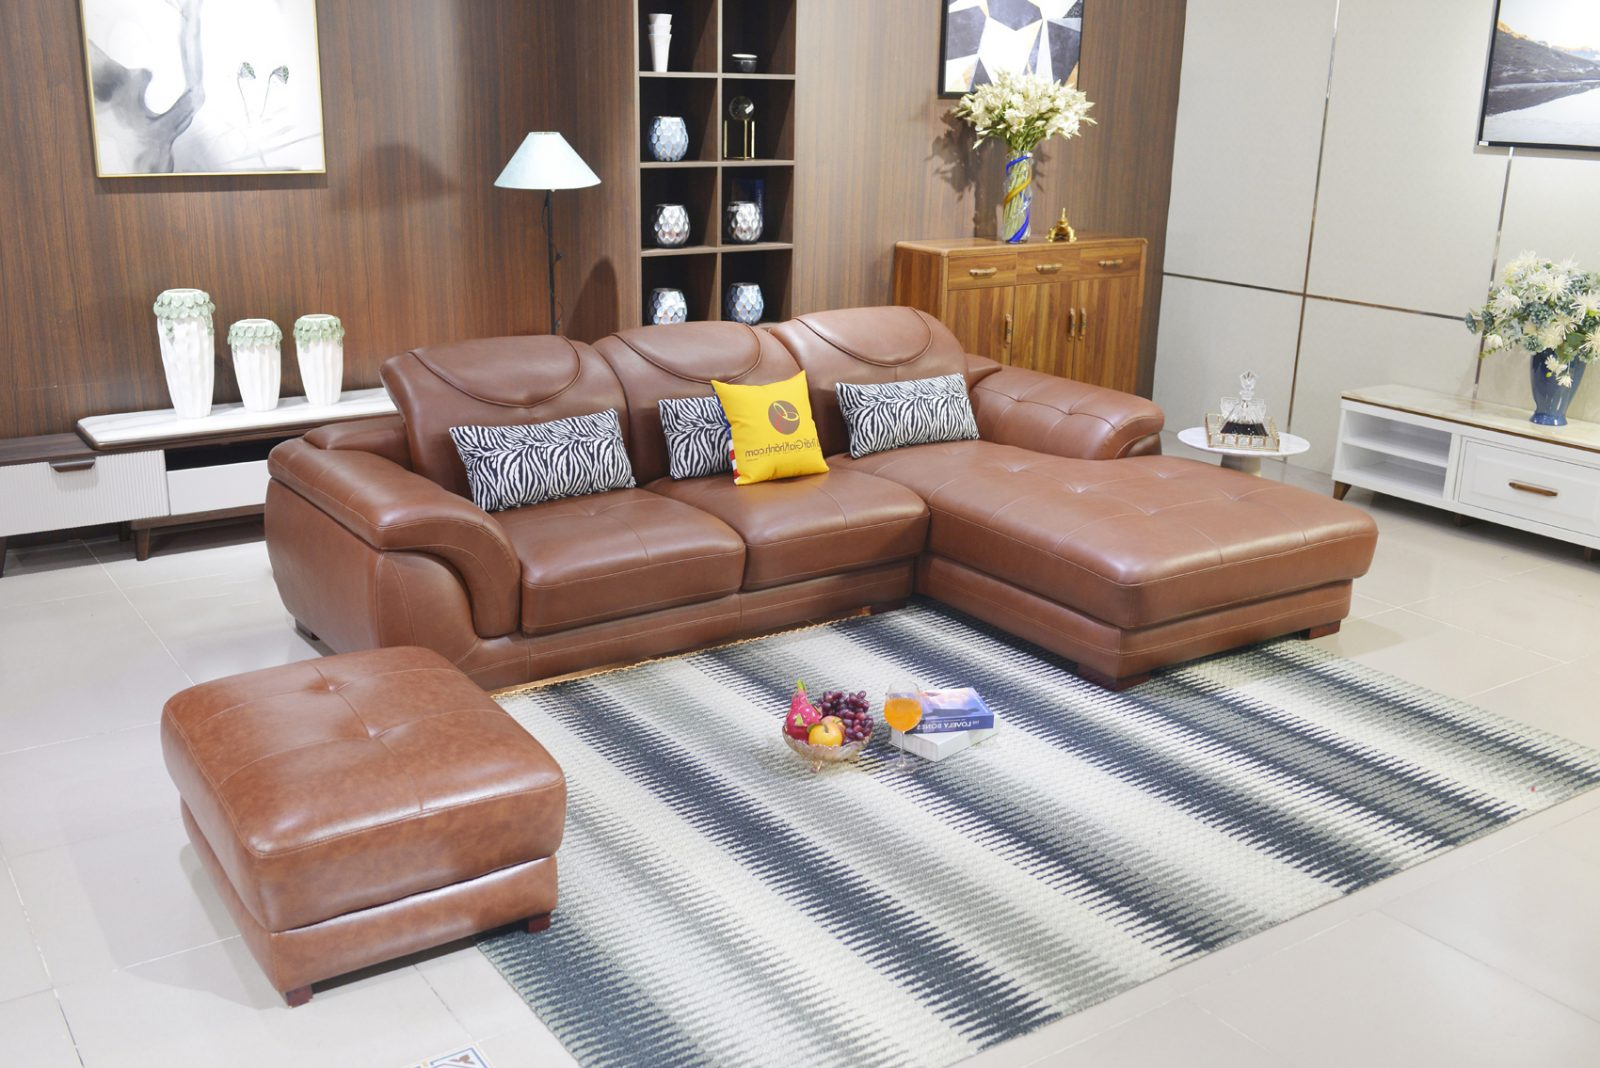 Sofa Da Góc Trái Màu Nâu Da Bò 9191B-Gt-N2096